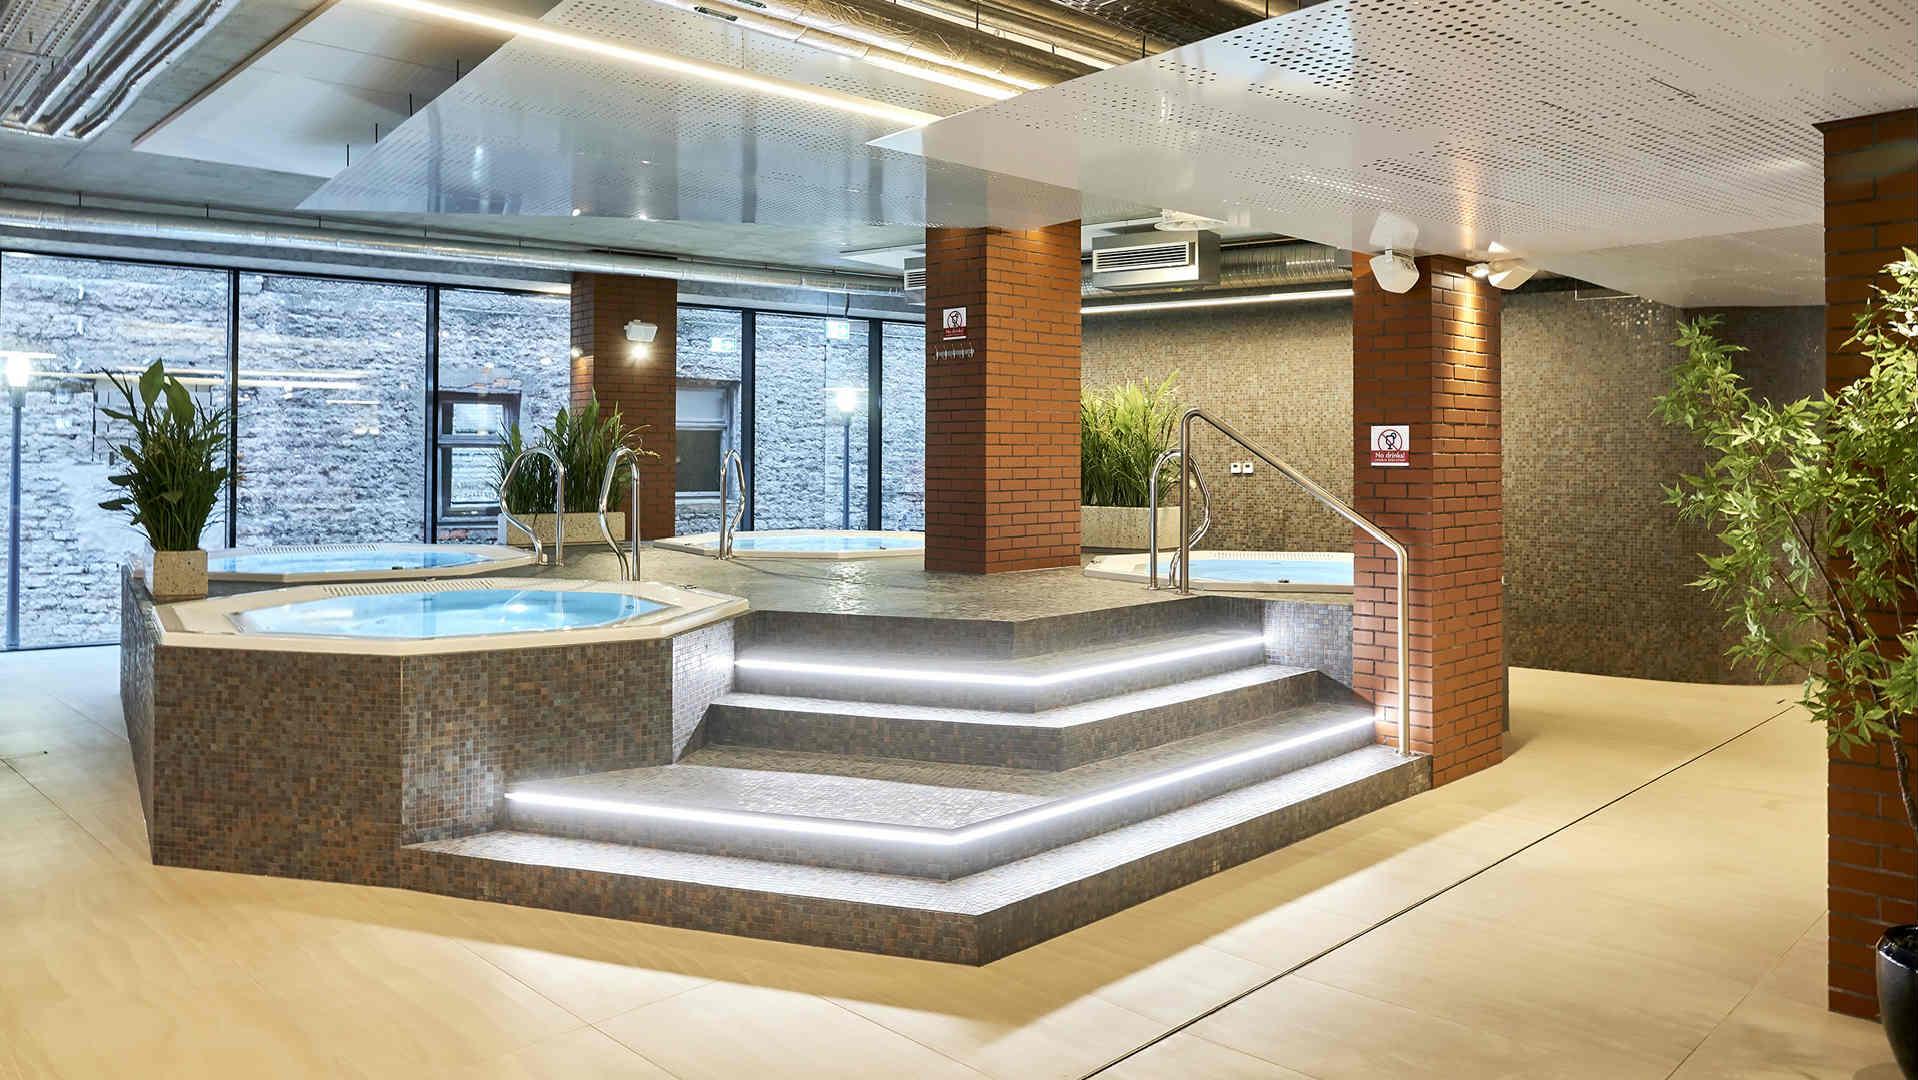 Spa and wellness |Metropol Spa Hotel |Tallinn spa